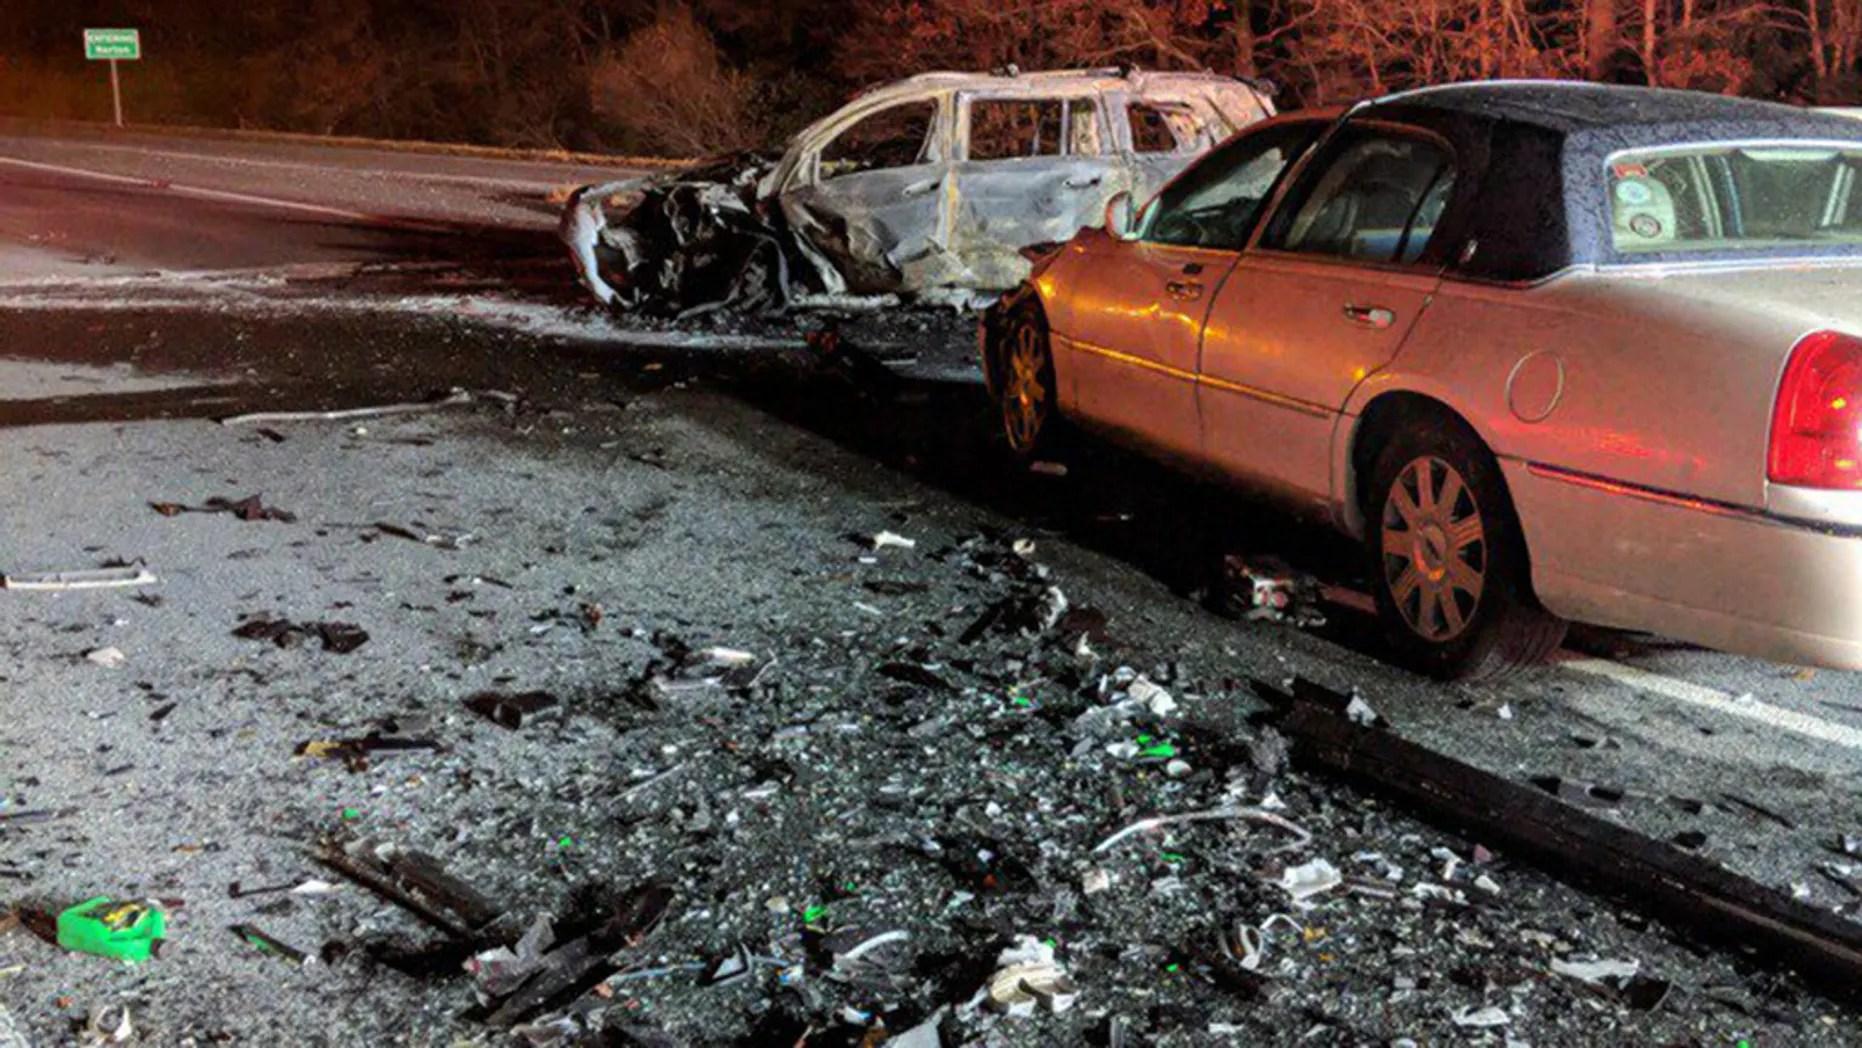 State Police spokesman Dave Procopio said the crash happened around 11:30 p.m. Wednesday on Interstate 495 in Taunton.